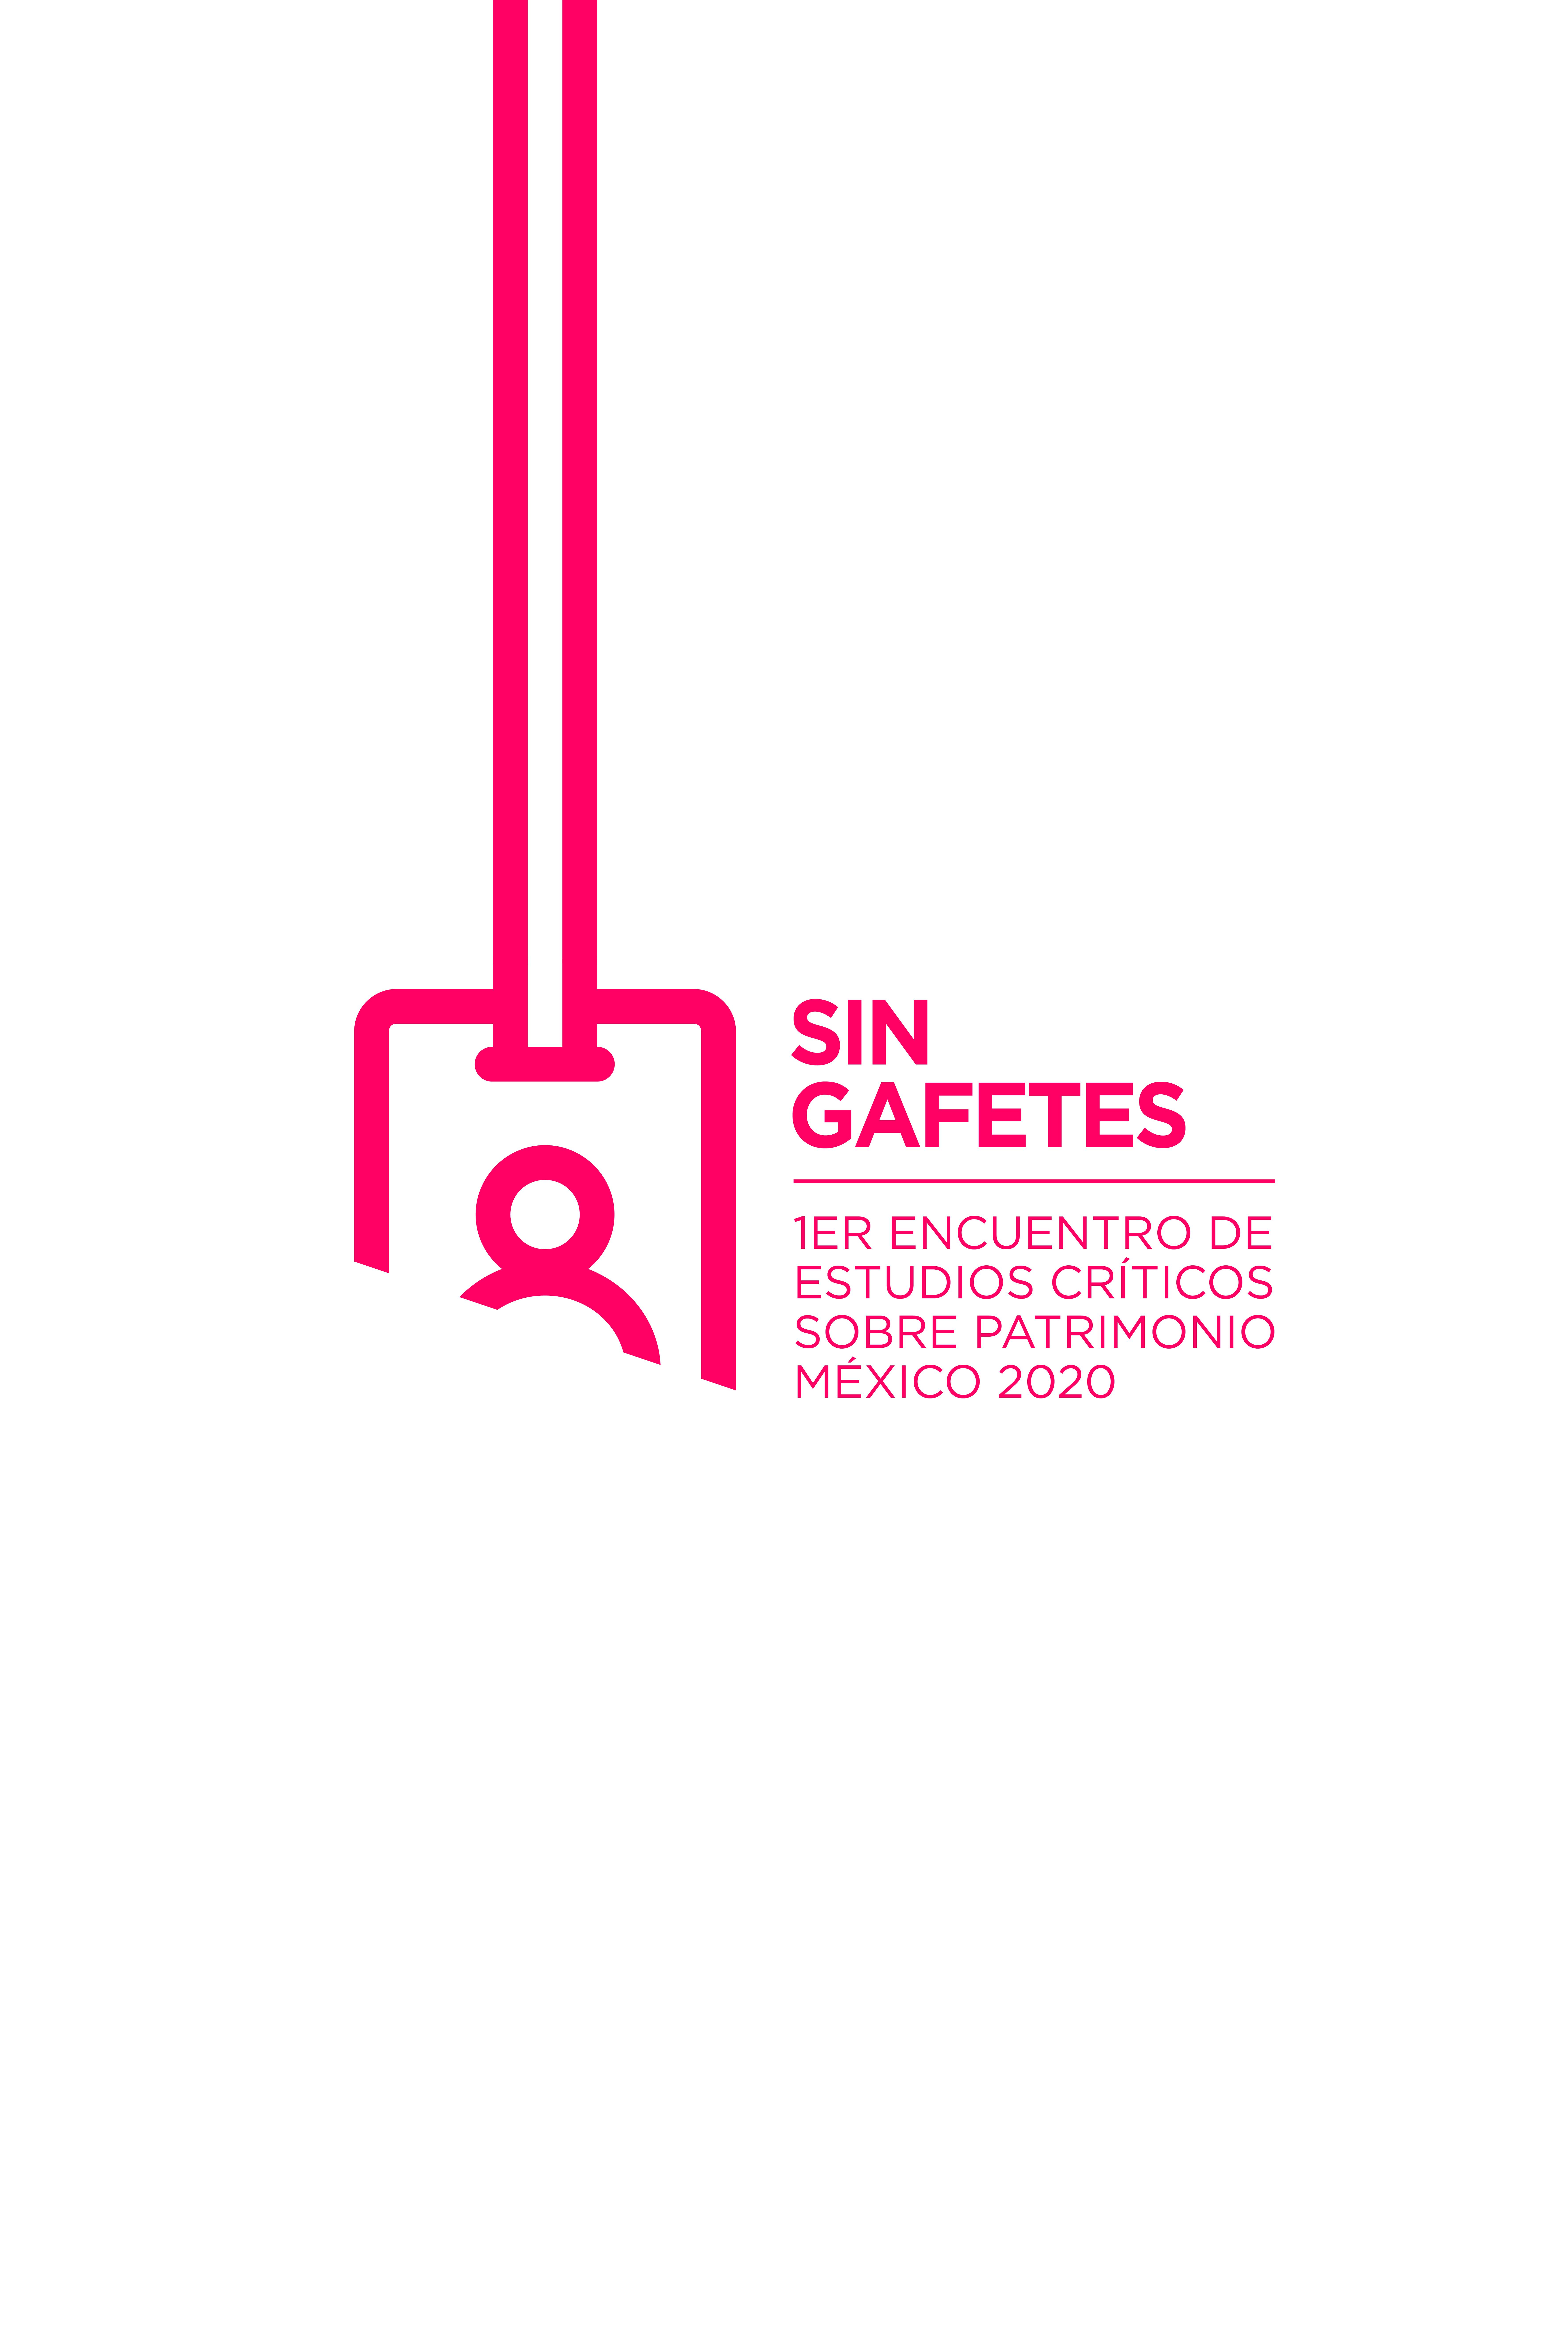 SIN GAFETES vertical-03